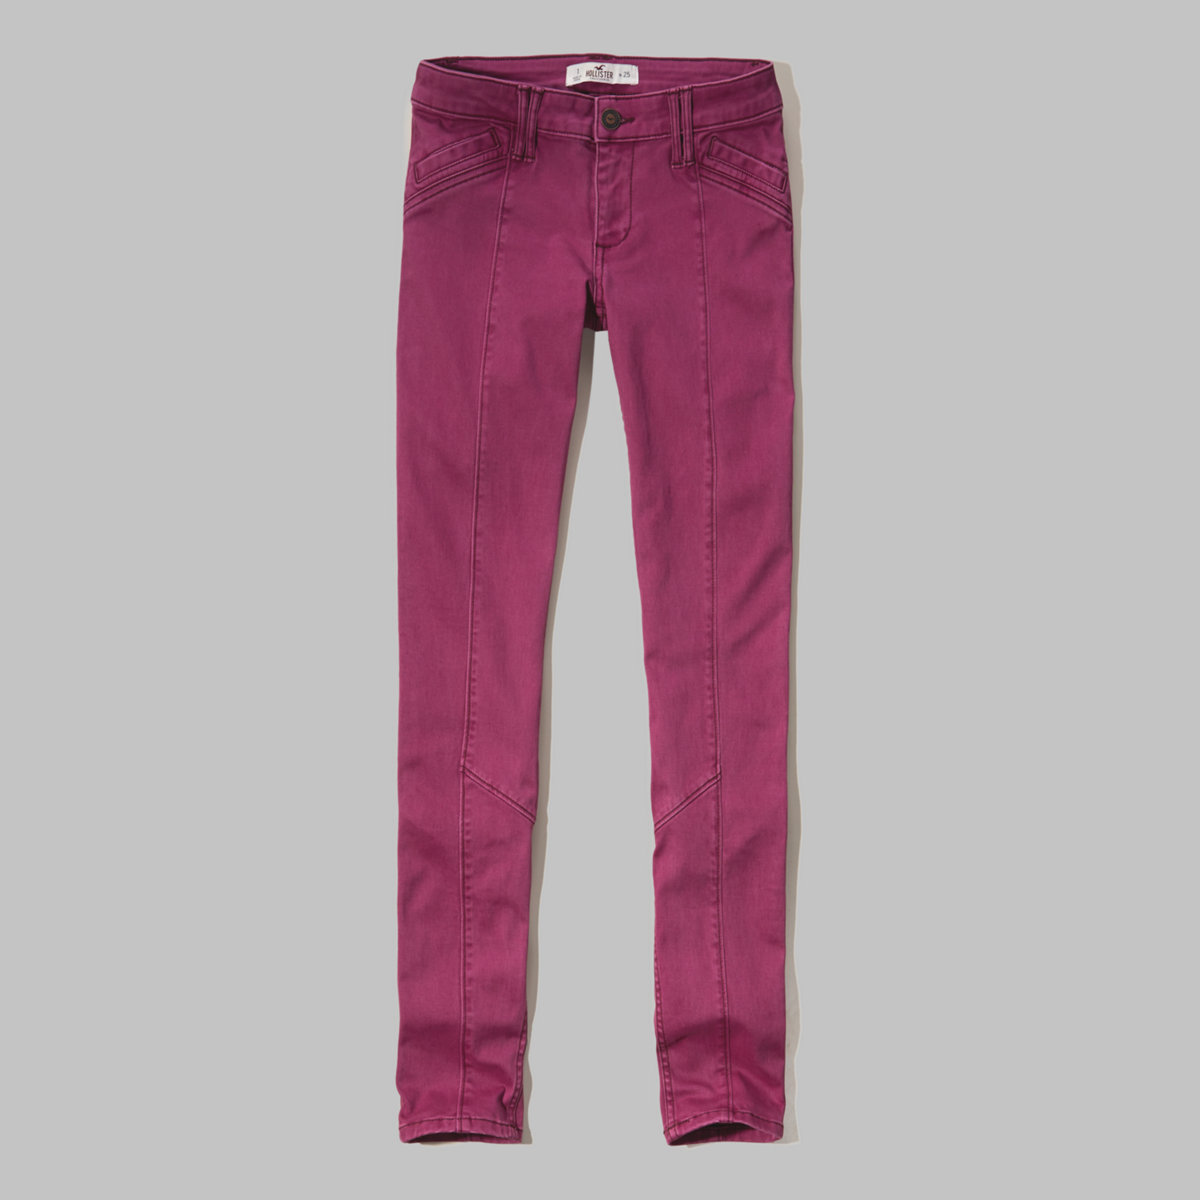 Hollister Super Skinny Utility Pants